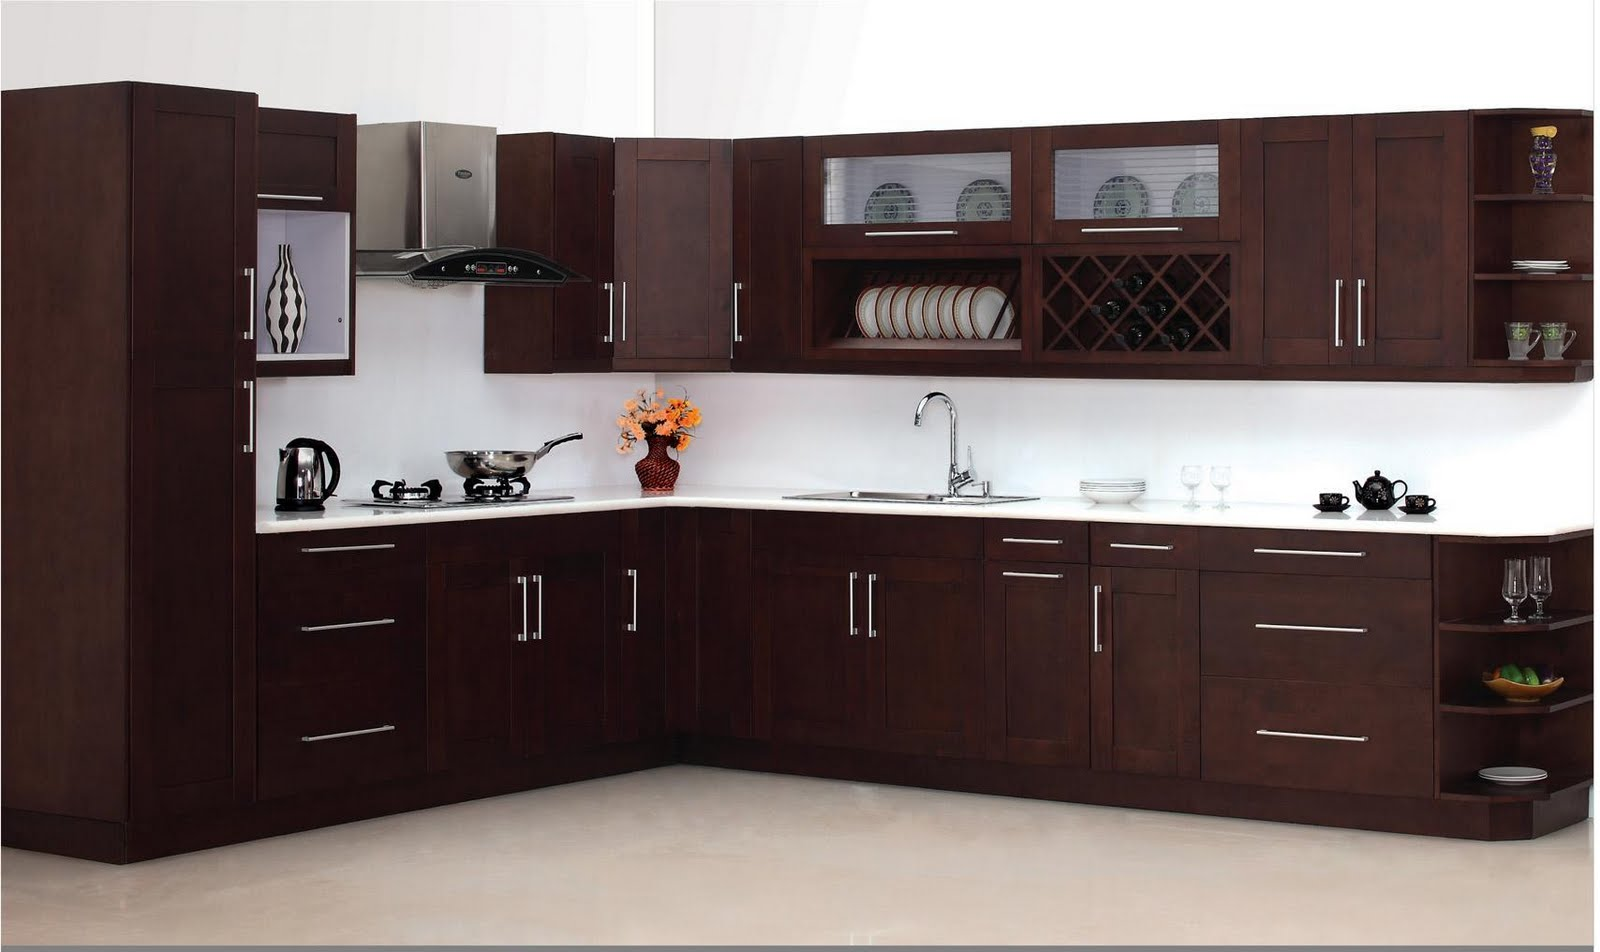 The Cabinet Spot: Espresso Shaker Maple Cabinets on Dark Maple Cabinets  id=89635